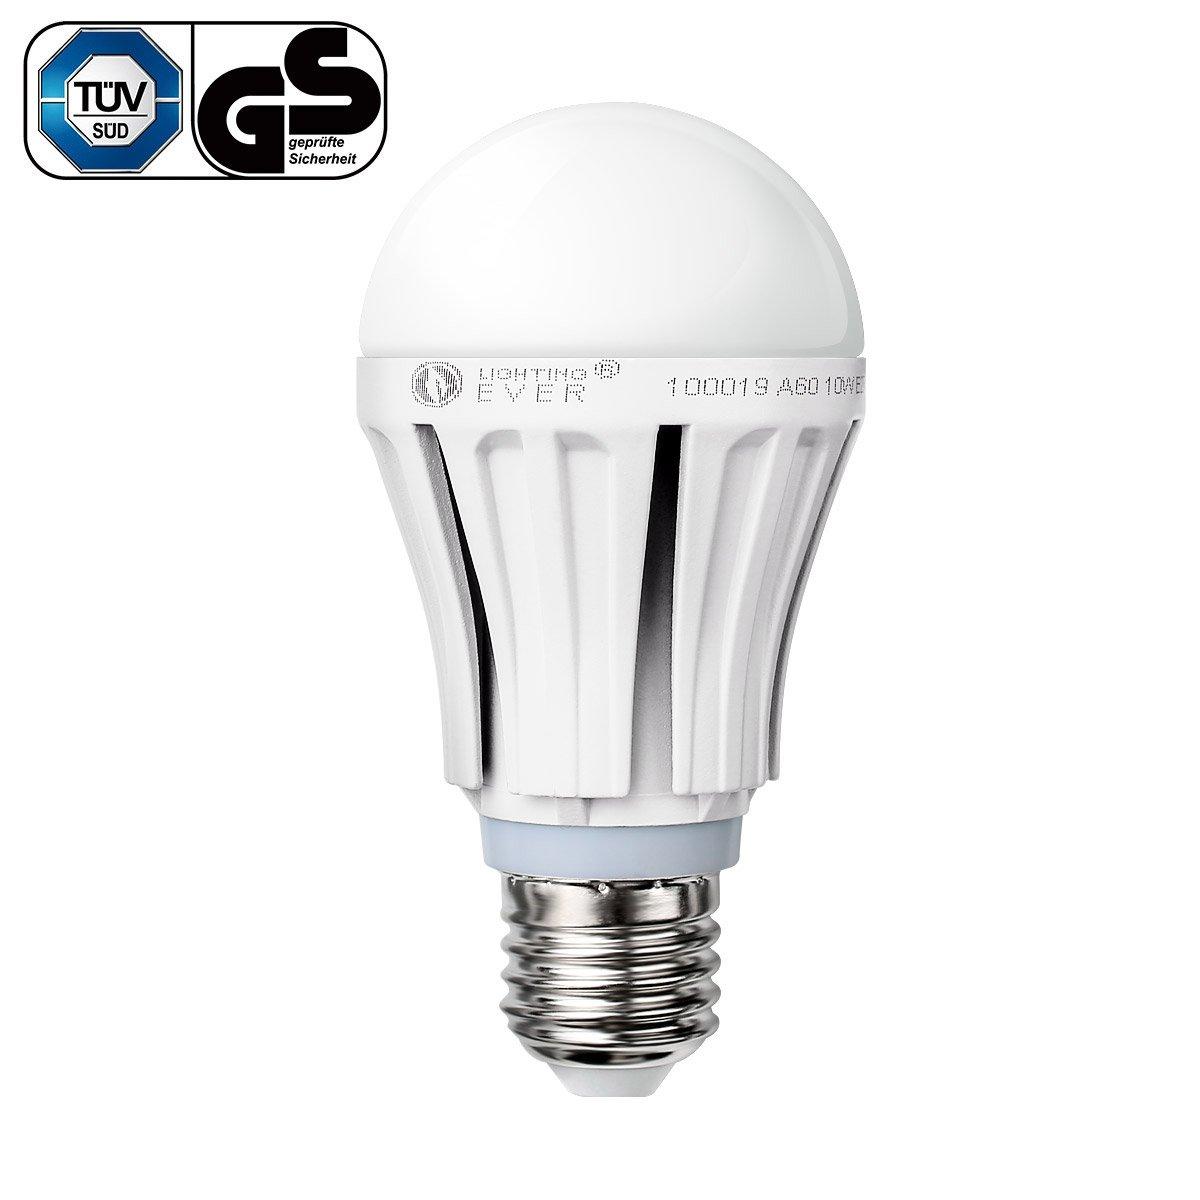 le 10w a19 e27 led bulbs 60w bulbs replacement 830lm samsung chip led daylight white led light bulbs 1 a led household light bulbs